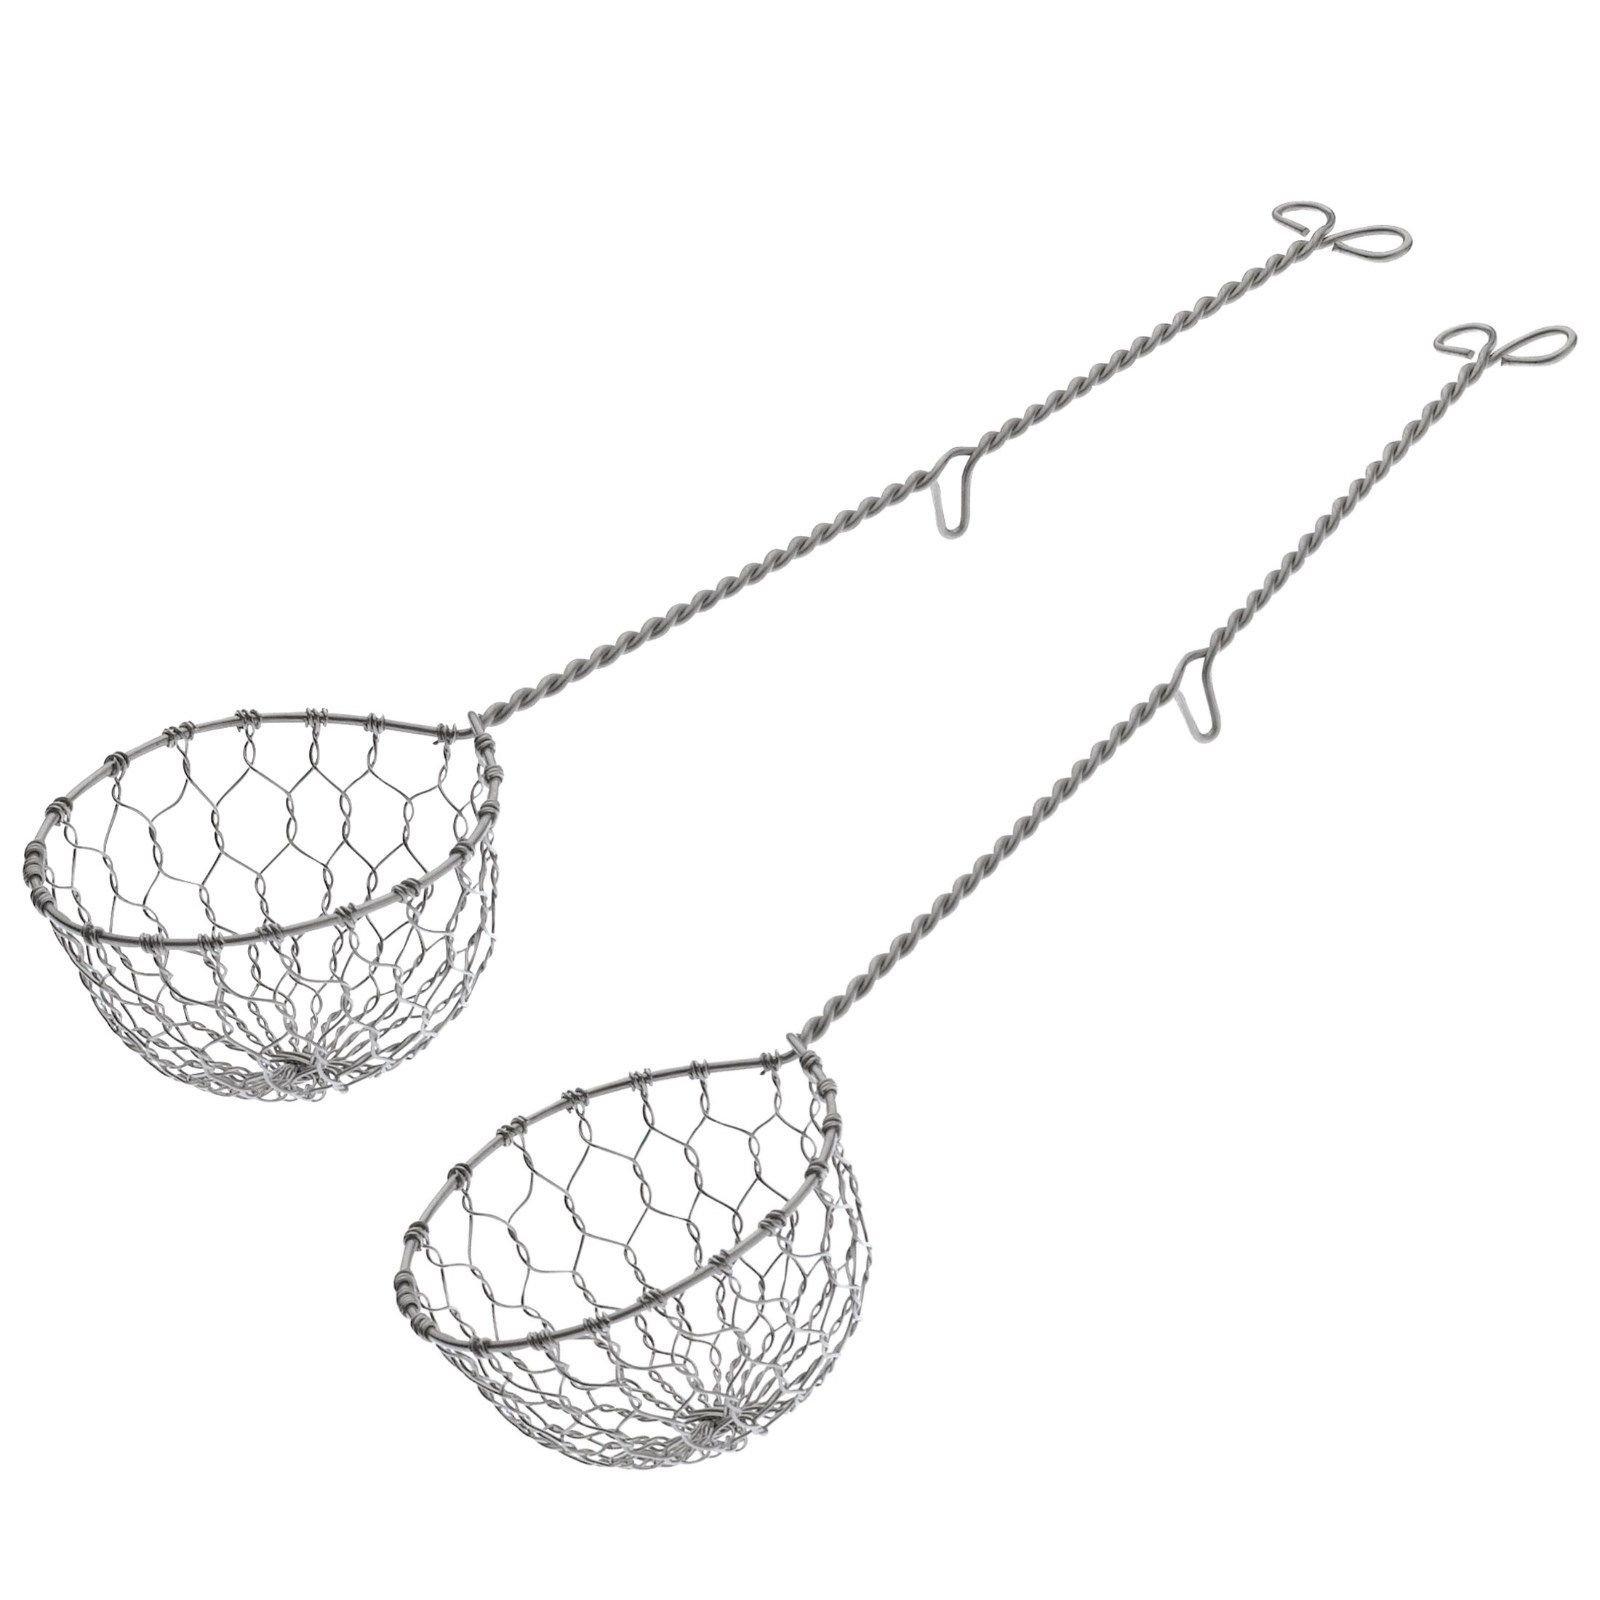 Kuchenprofi Stainless Steel Fondue Spoon - Set of 2